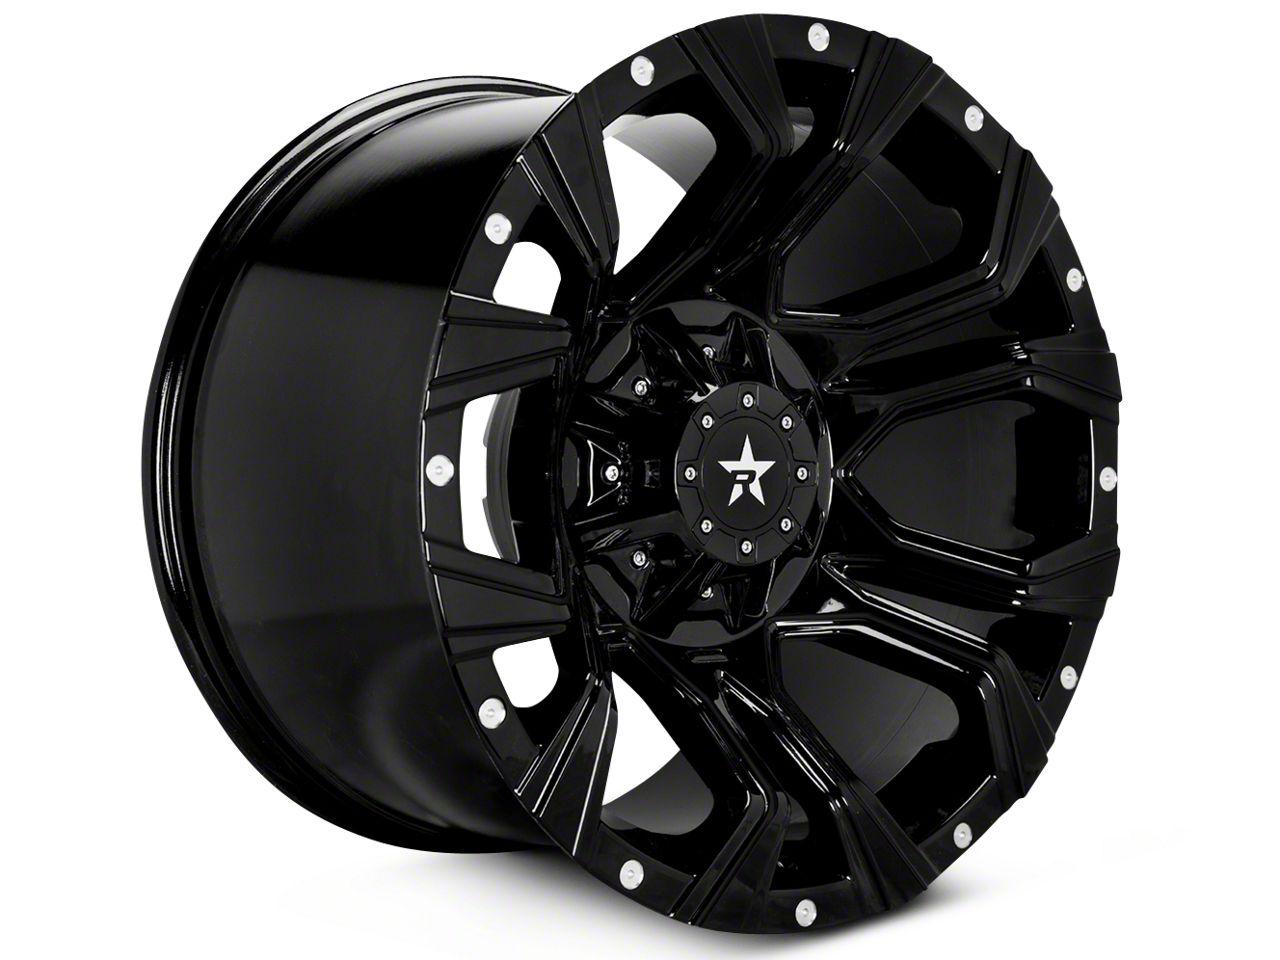 RBP 64R Widow Black Machined 5-Lug Wheel - 18x9 (02-18 RAM 1500, Excluding Mega Cab)